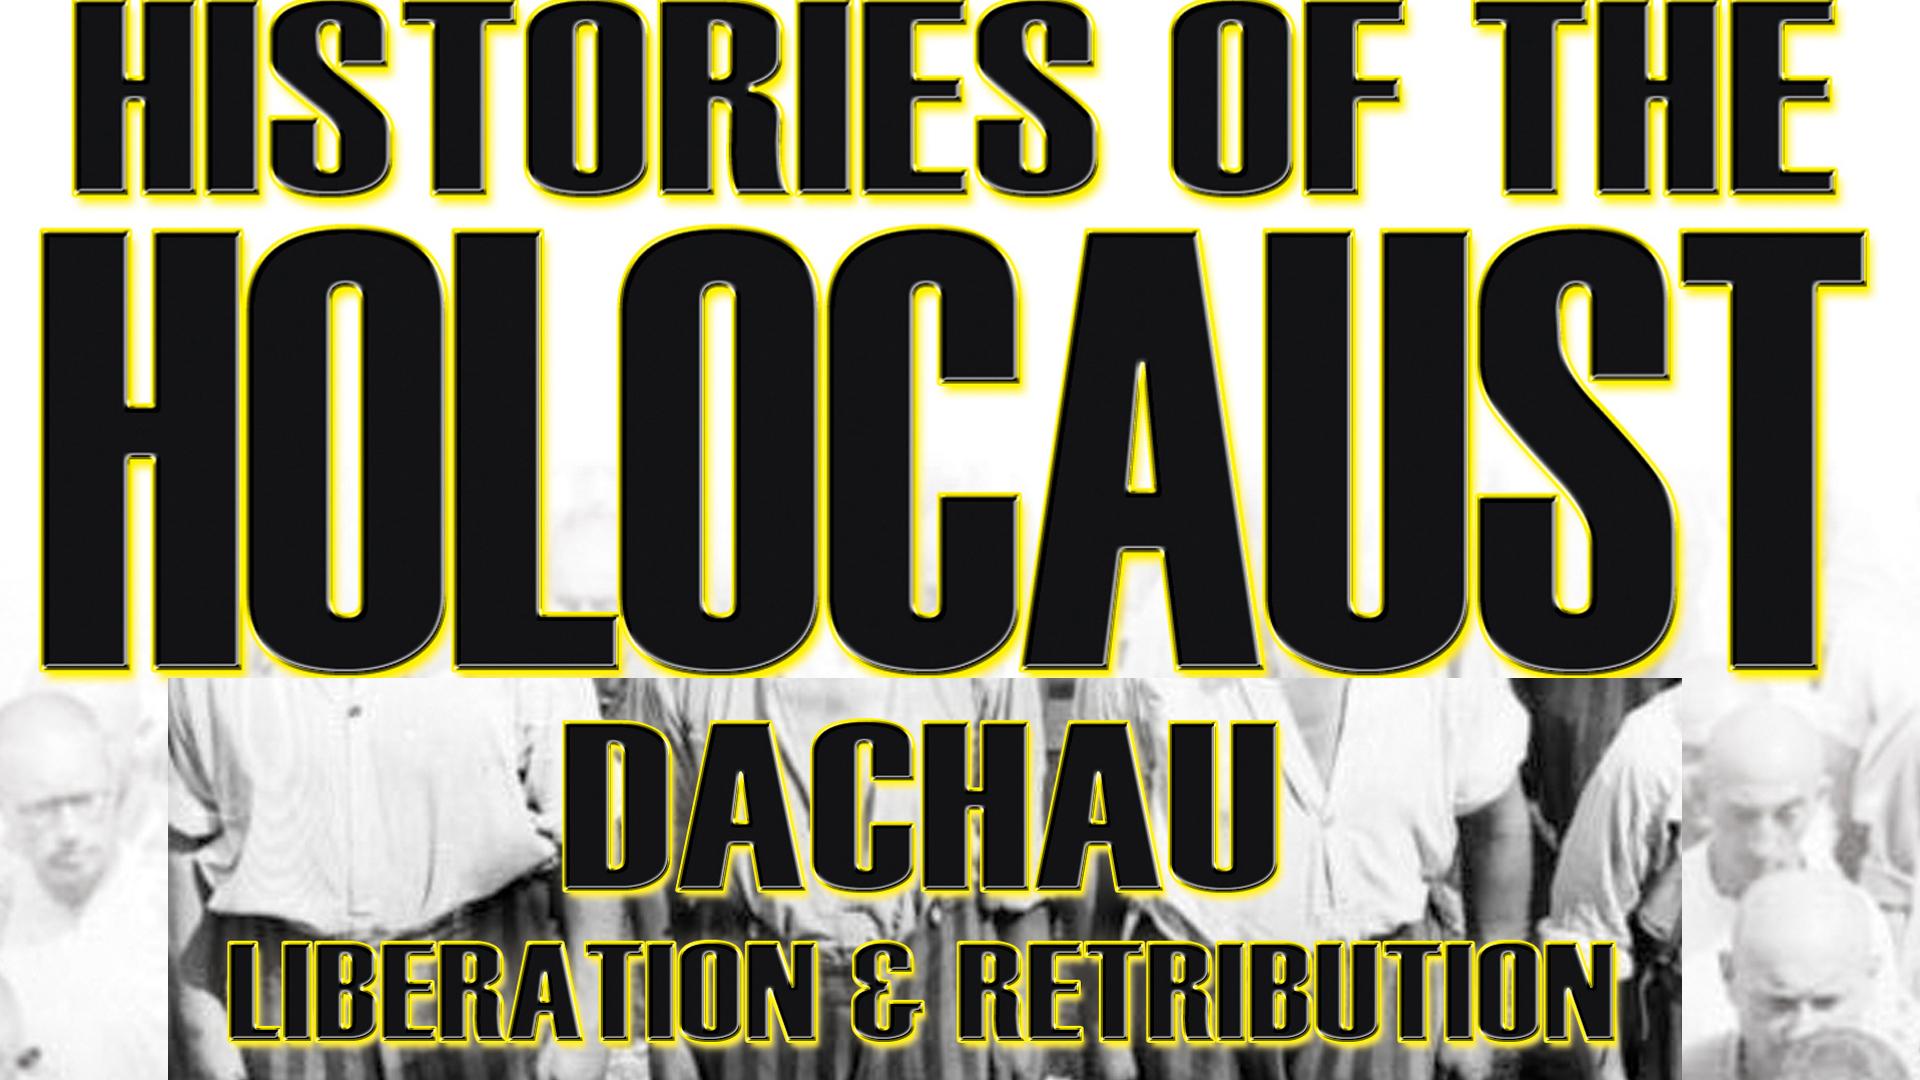 Histories Of The Holocaust: Dachau - Liberation And Retribution